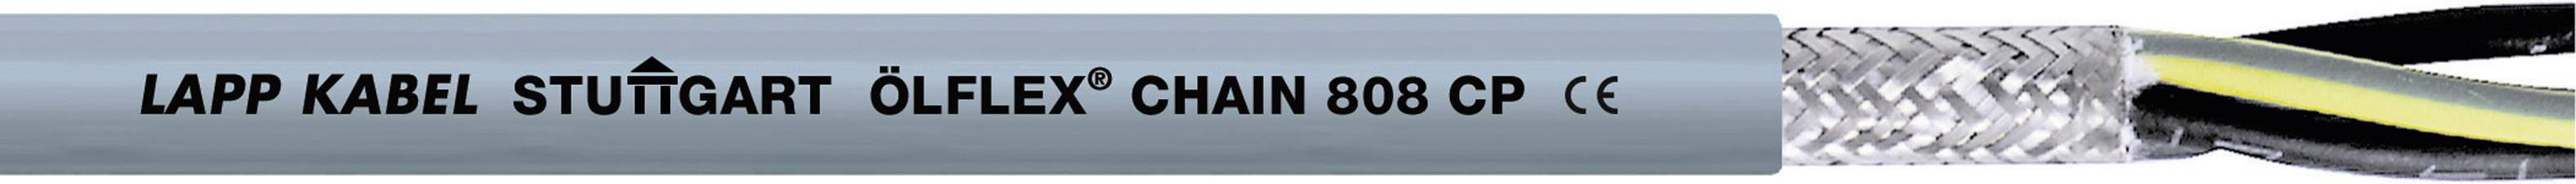 Žíla kabelu LappKabel ÖLFLEX CHAIN 808 CP 7G0,5 (1027755), 7x 0,5 mm², polyurethan, Ø 8,5 mm, stíněný, 1 m, še